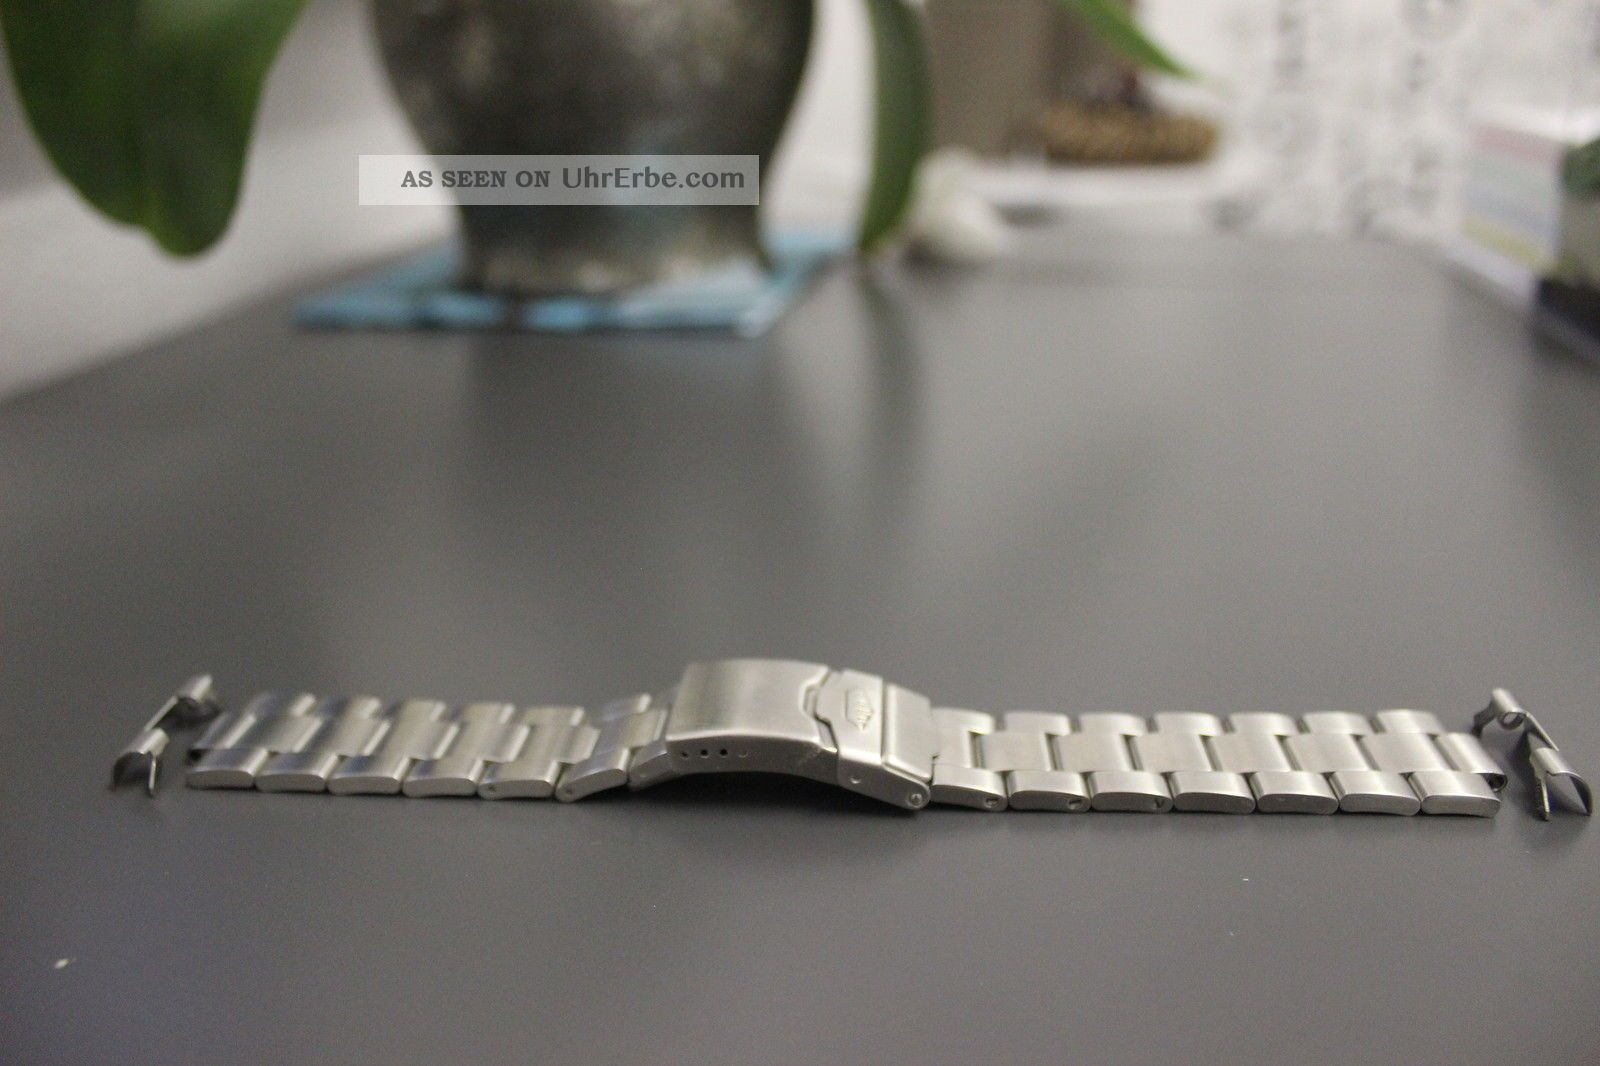 Fortis No B - 42,  Flieger - Stratoliner Edelstahlband Neuwertig Armbanduhren Bild